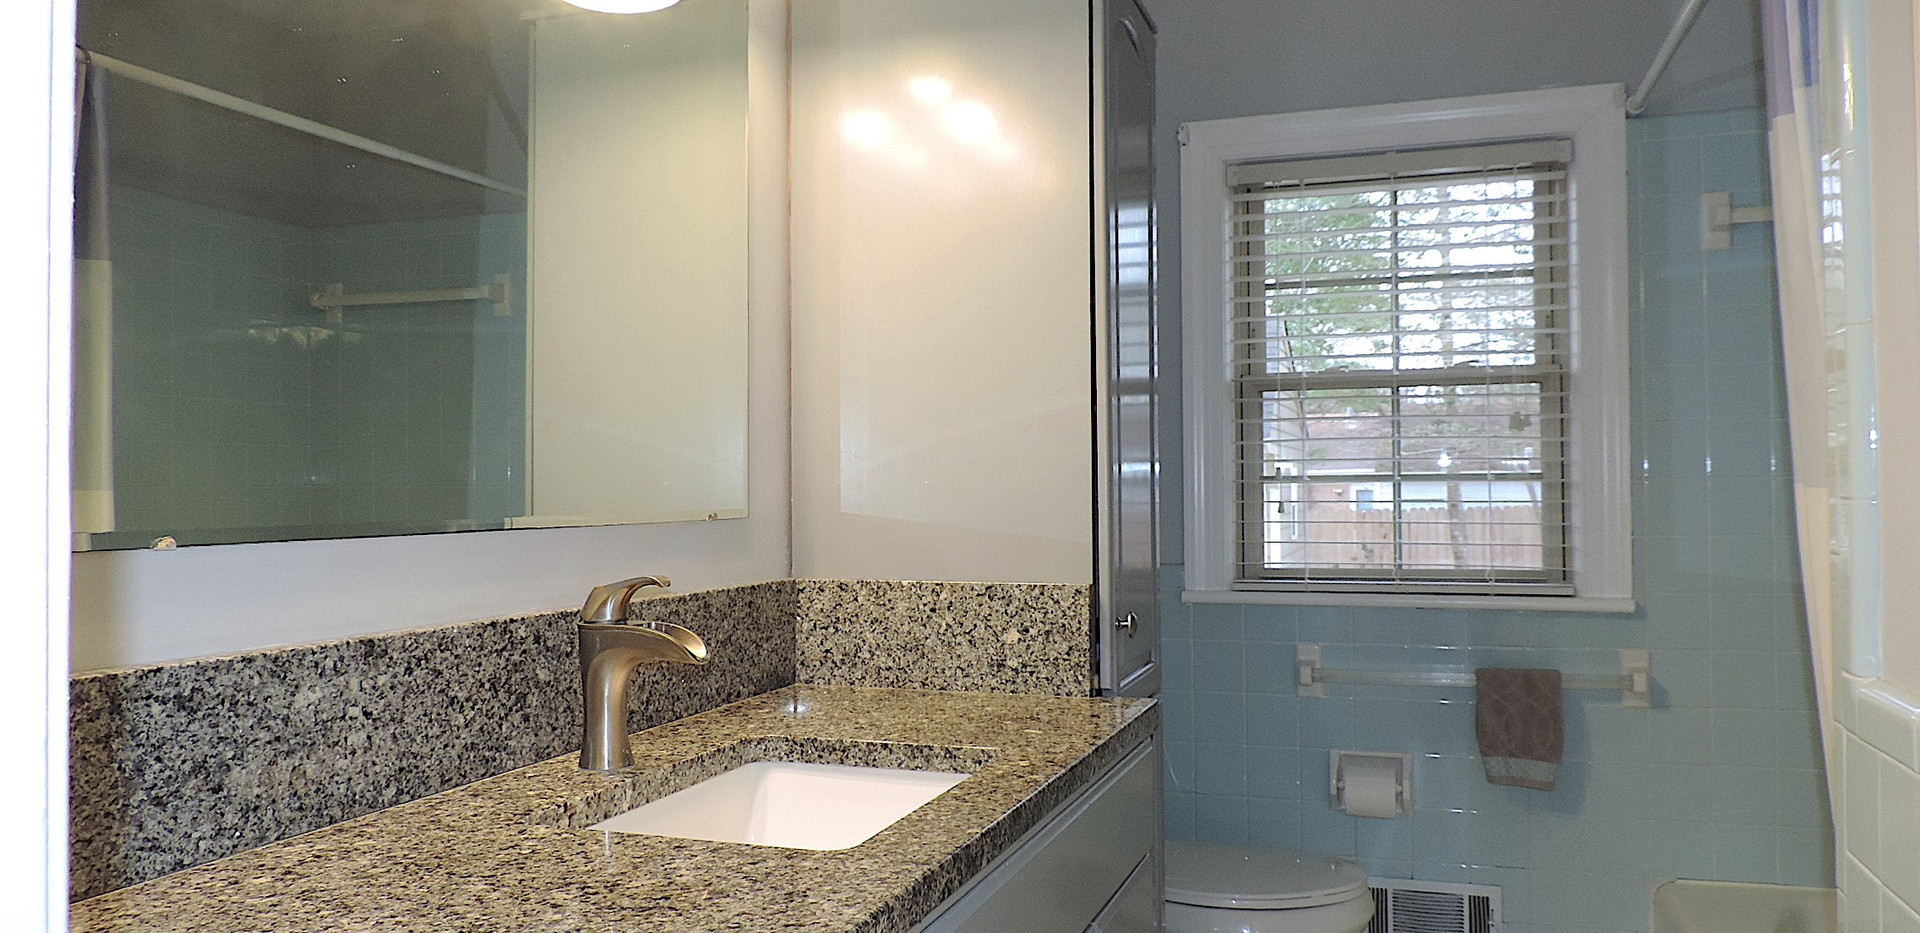 9 Hall Bathroom.jpg